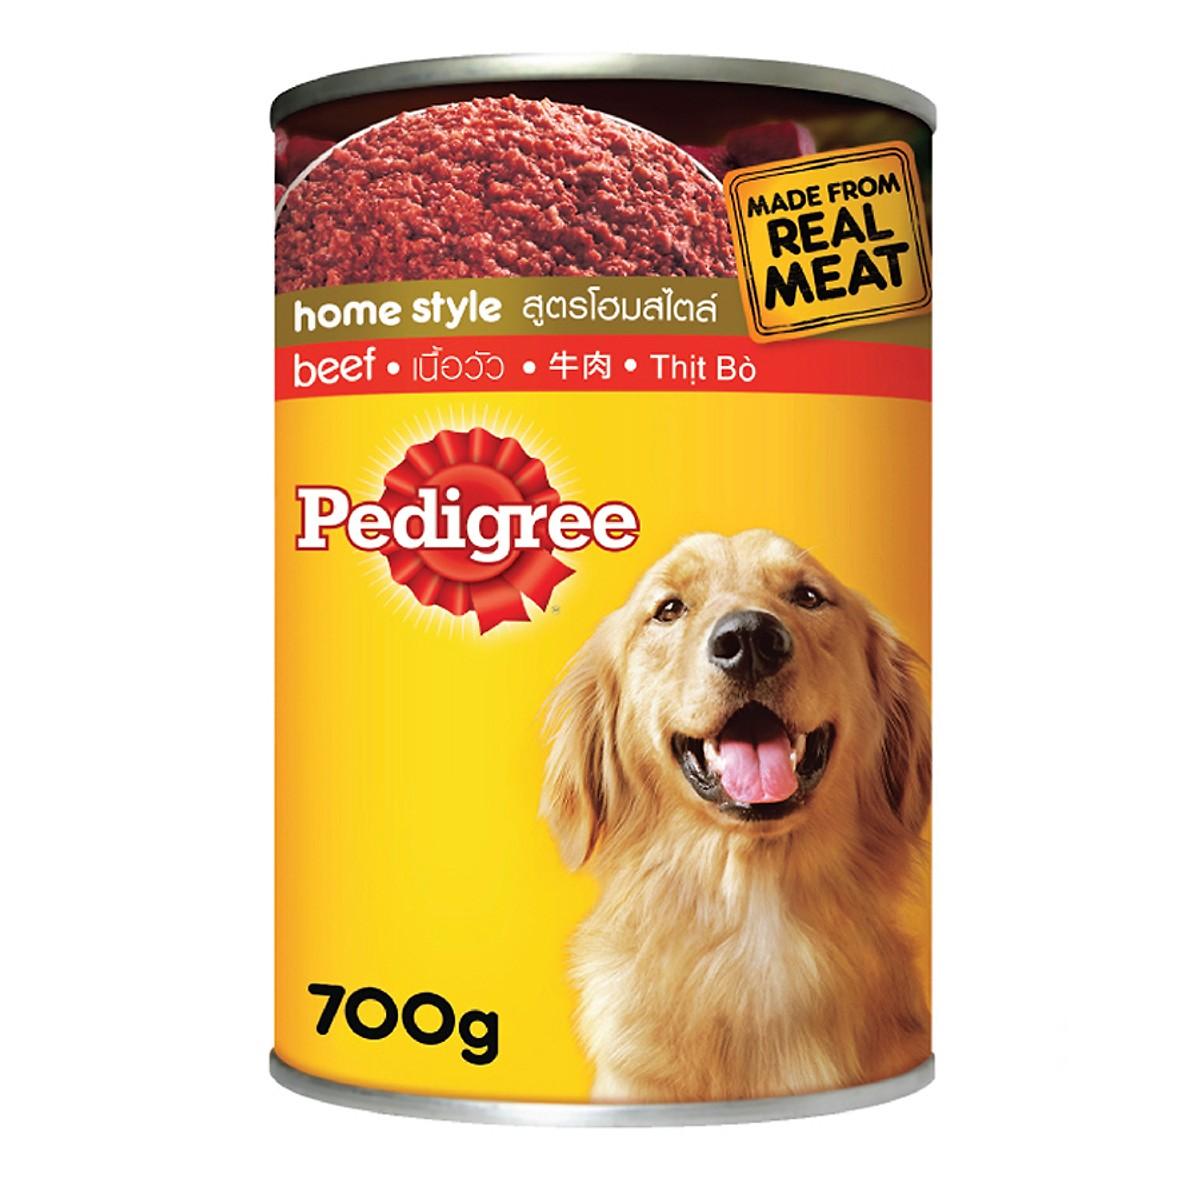 Pate Pedigree thịt bò 700g